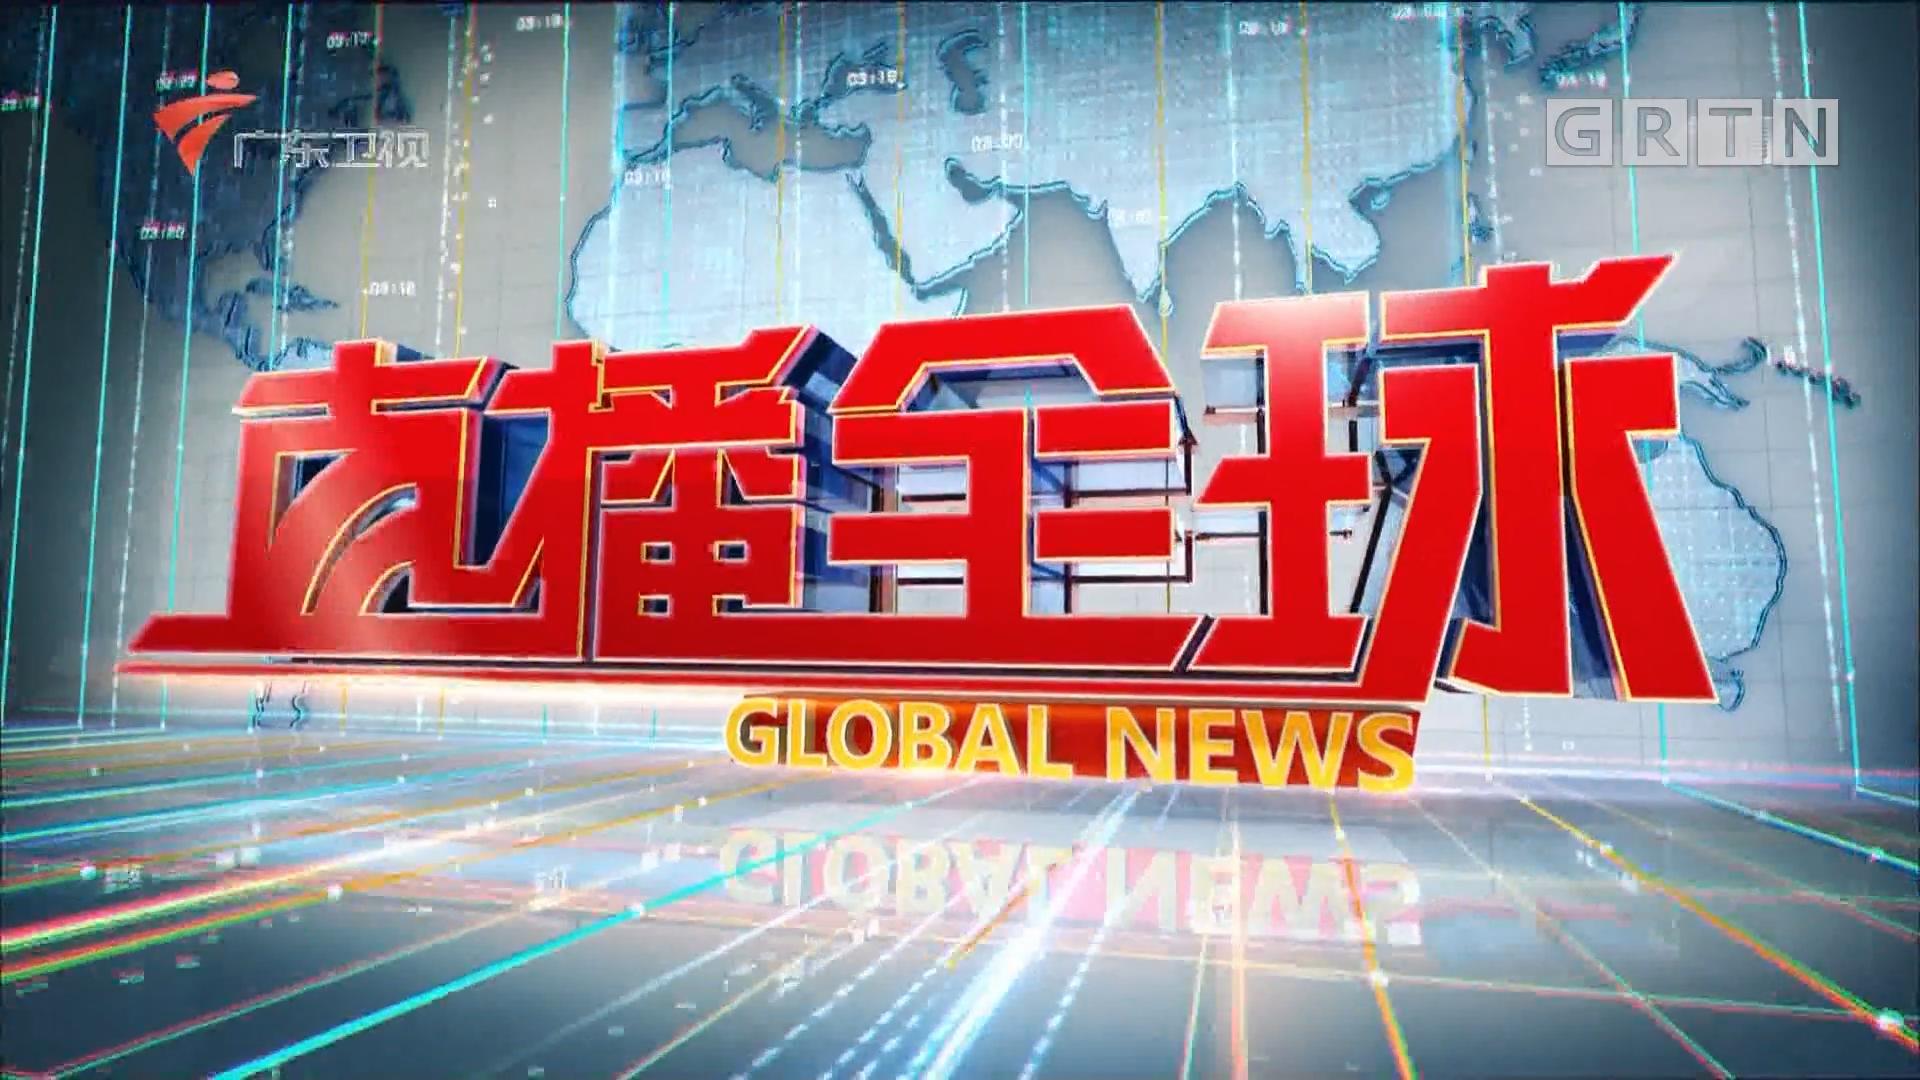 [HD][2019-04-04]直播全球:粤港澳大湾区再添黄金通道 快速交通网络加快形成